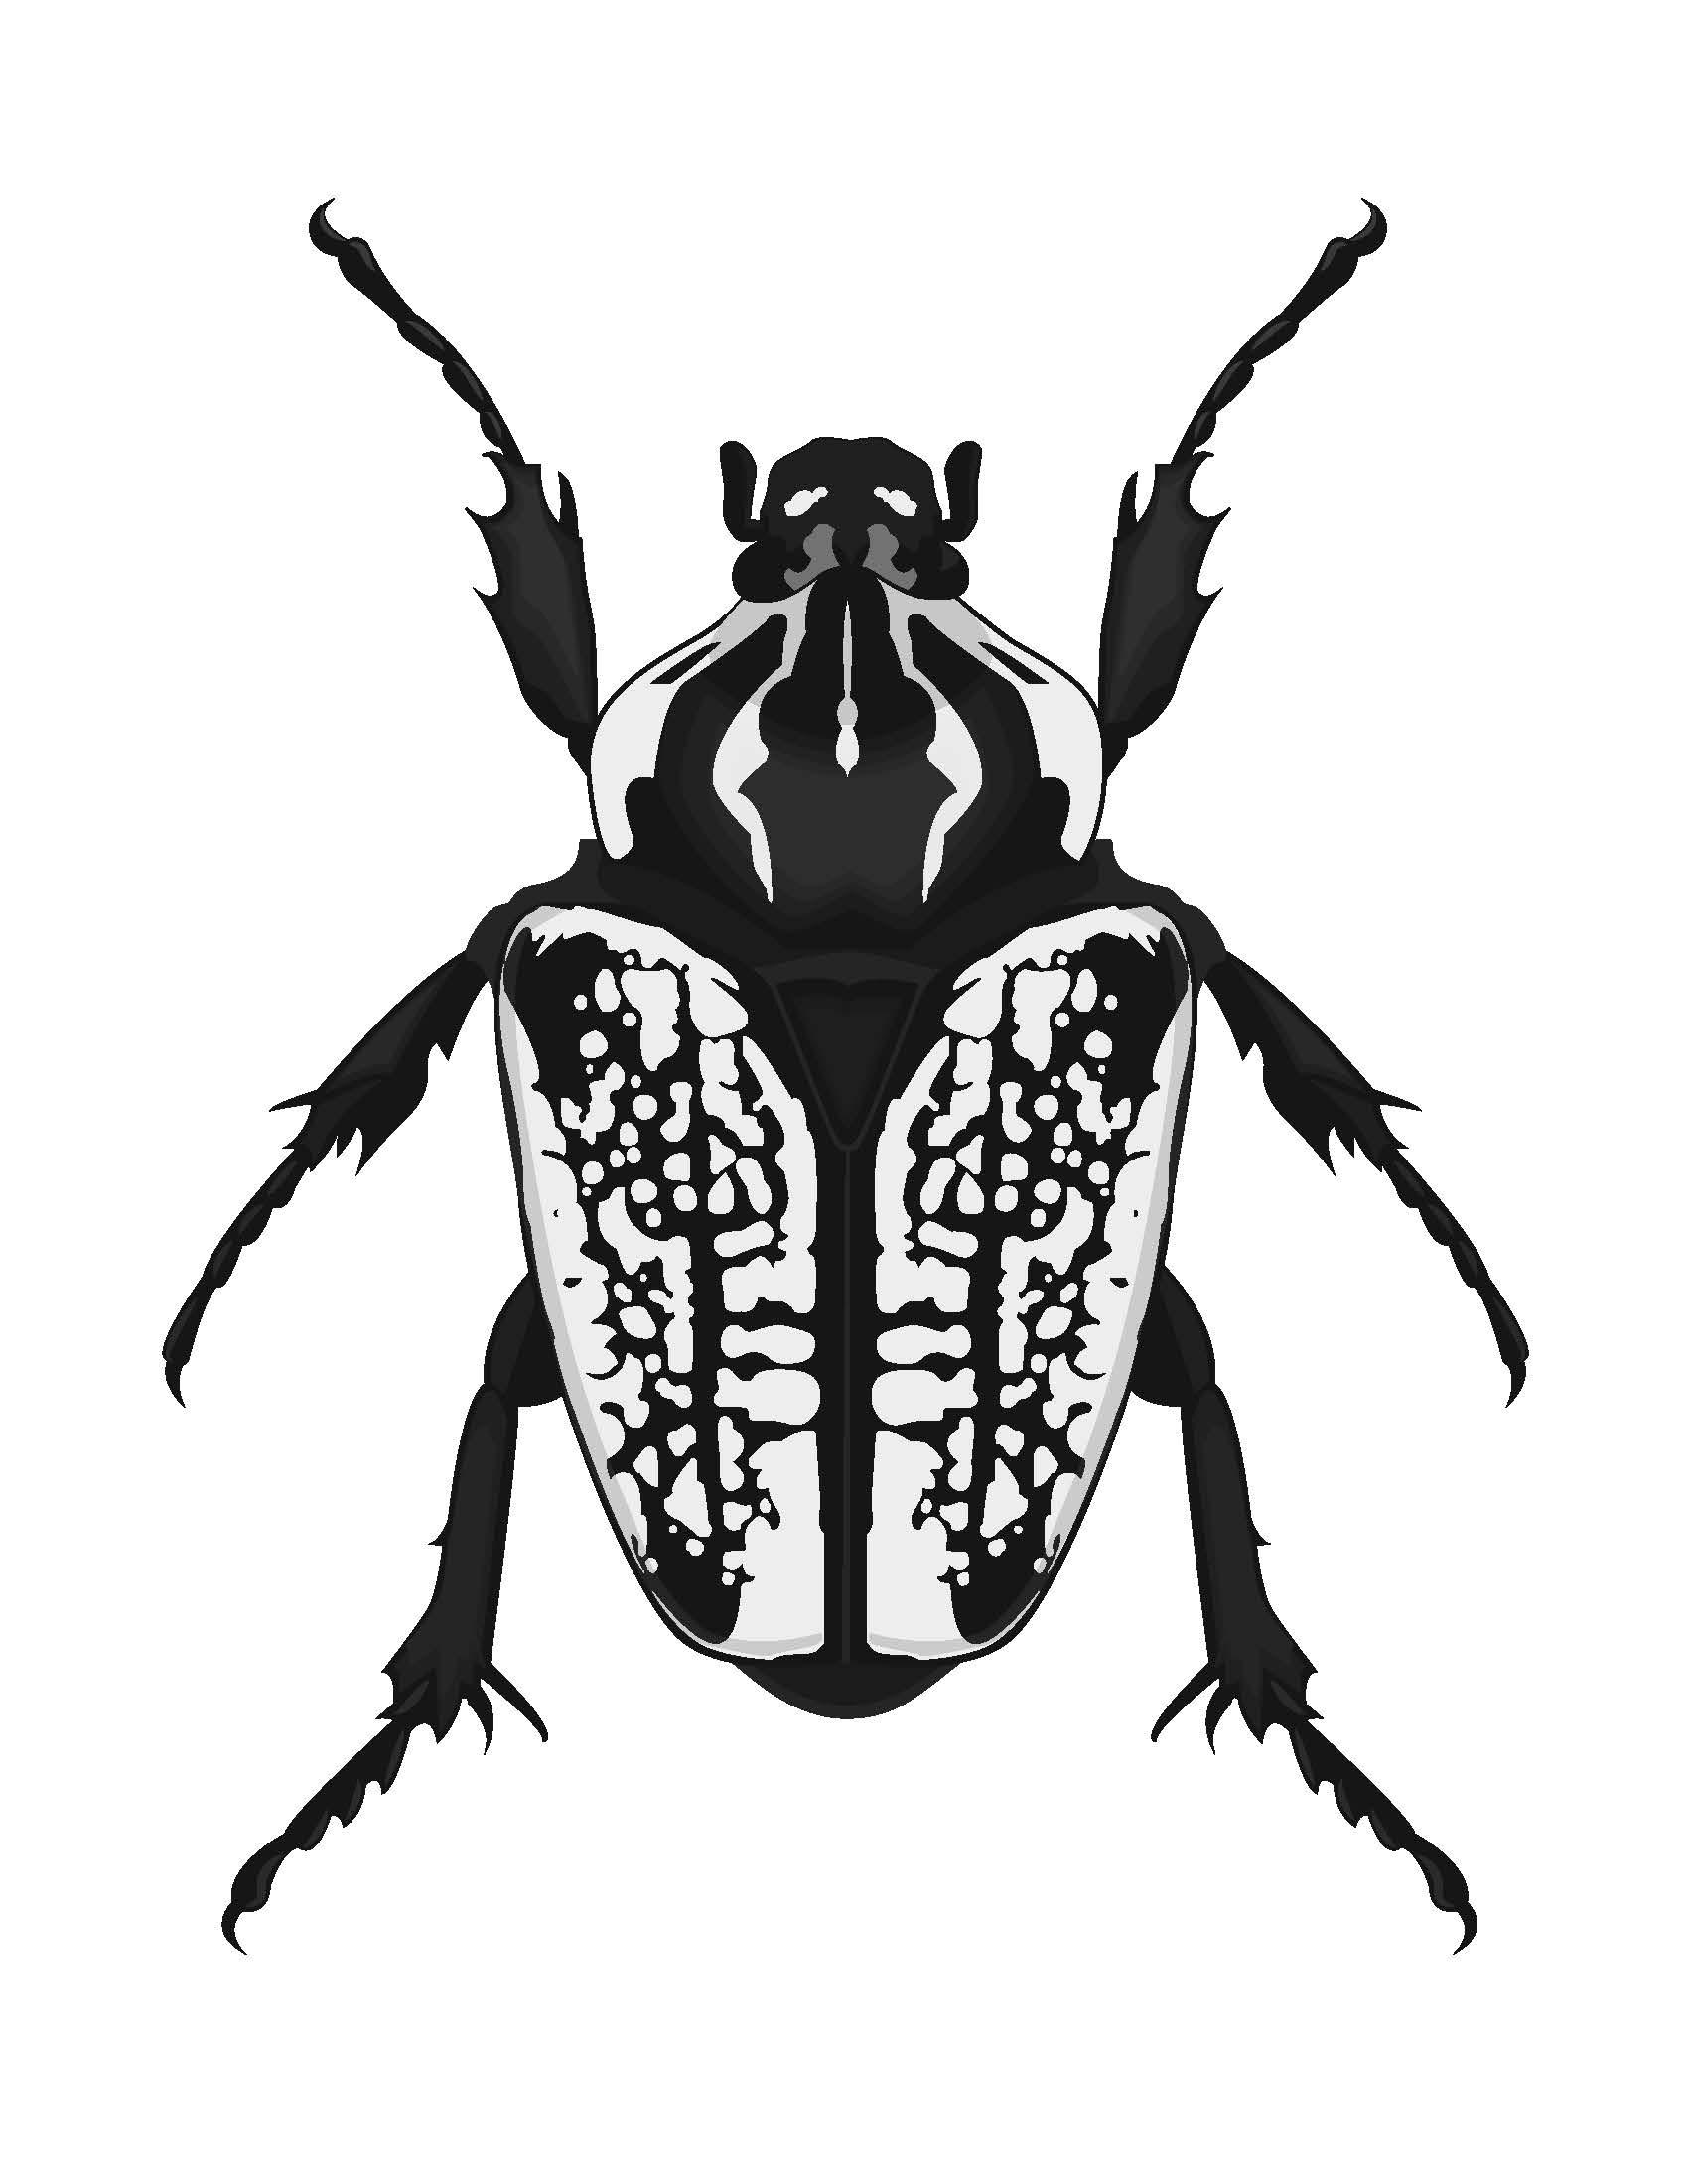 Goliath Beetle, 2012